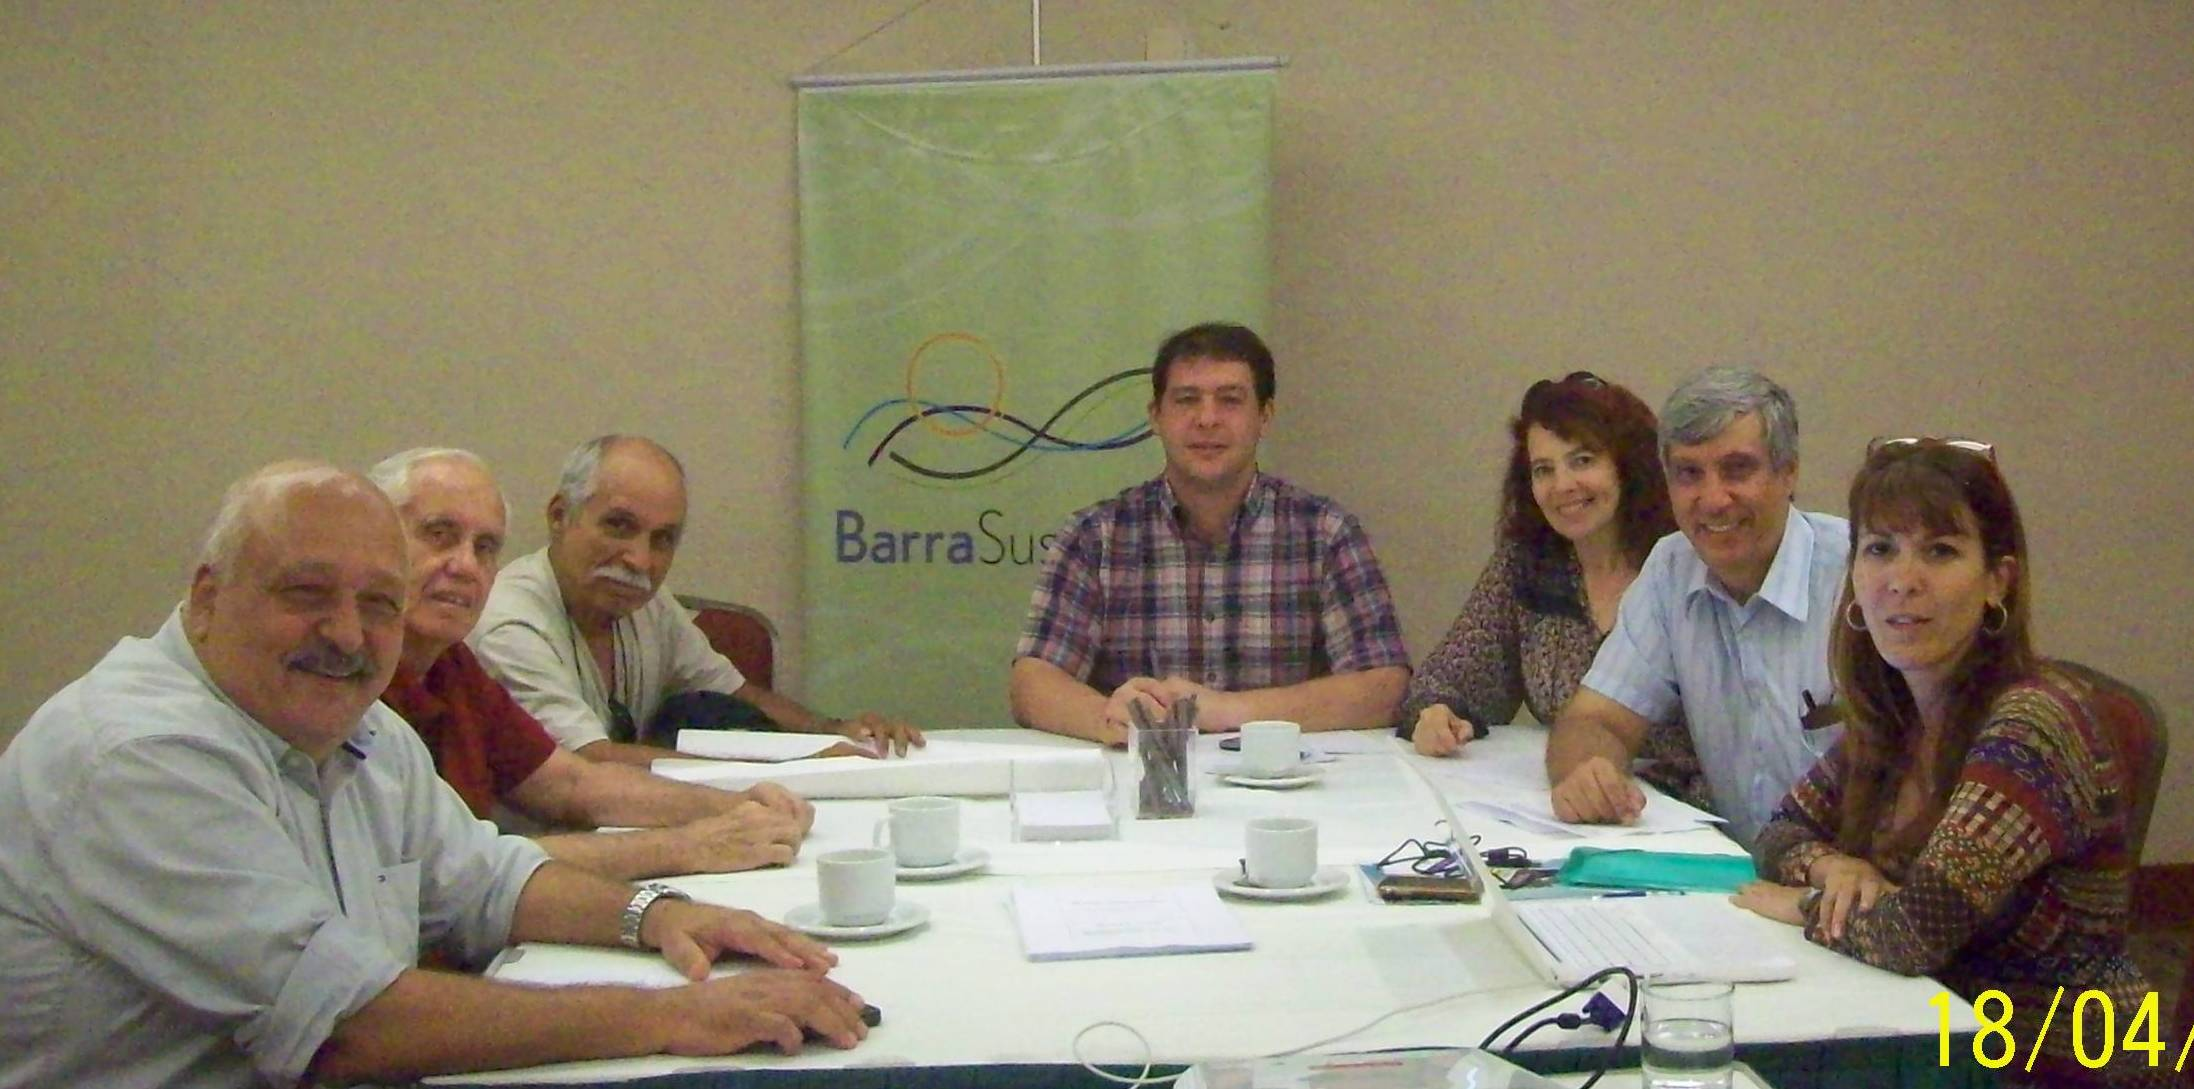 GTs Barra Sustentável